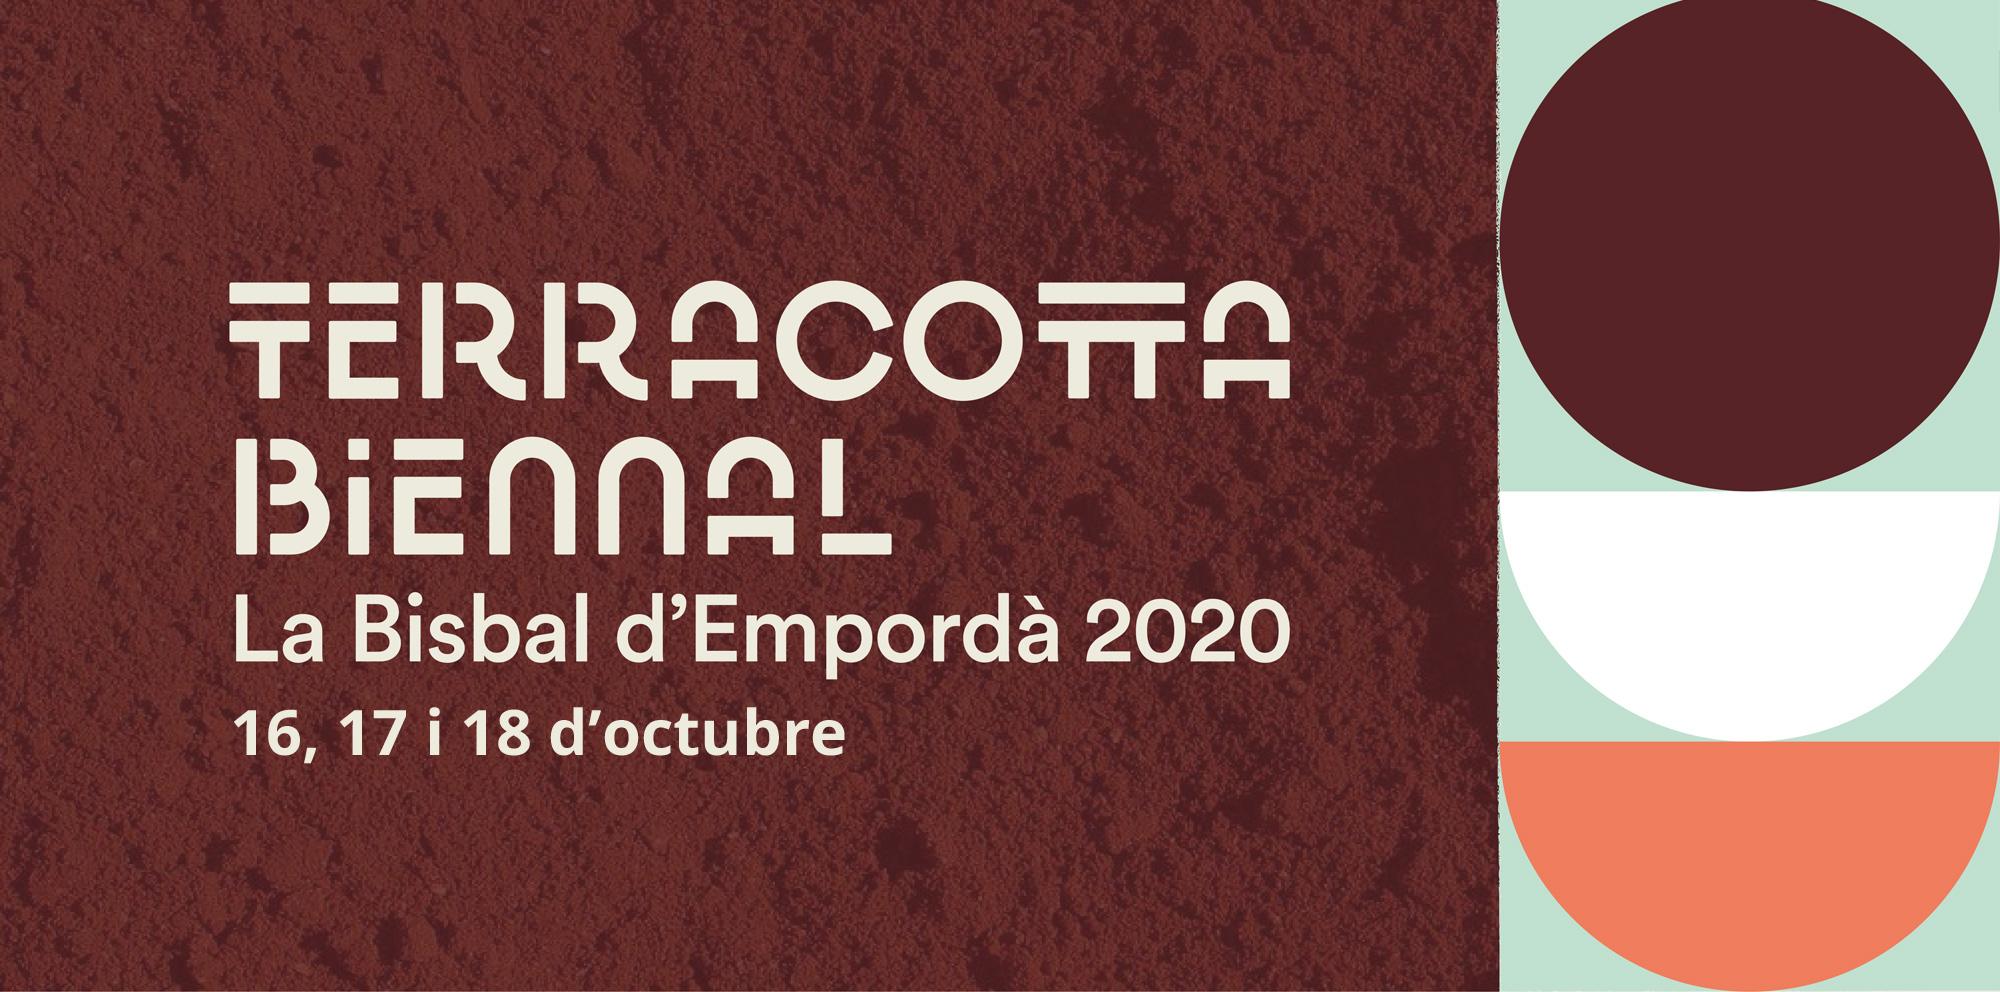 La Bisbal (Girona): Convocatoria Terracotta Biennal